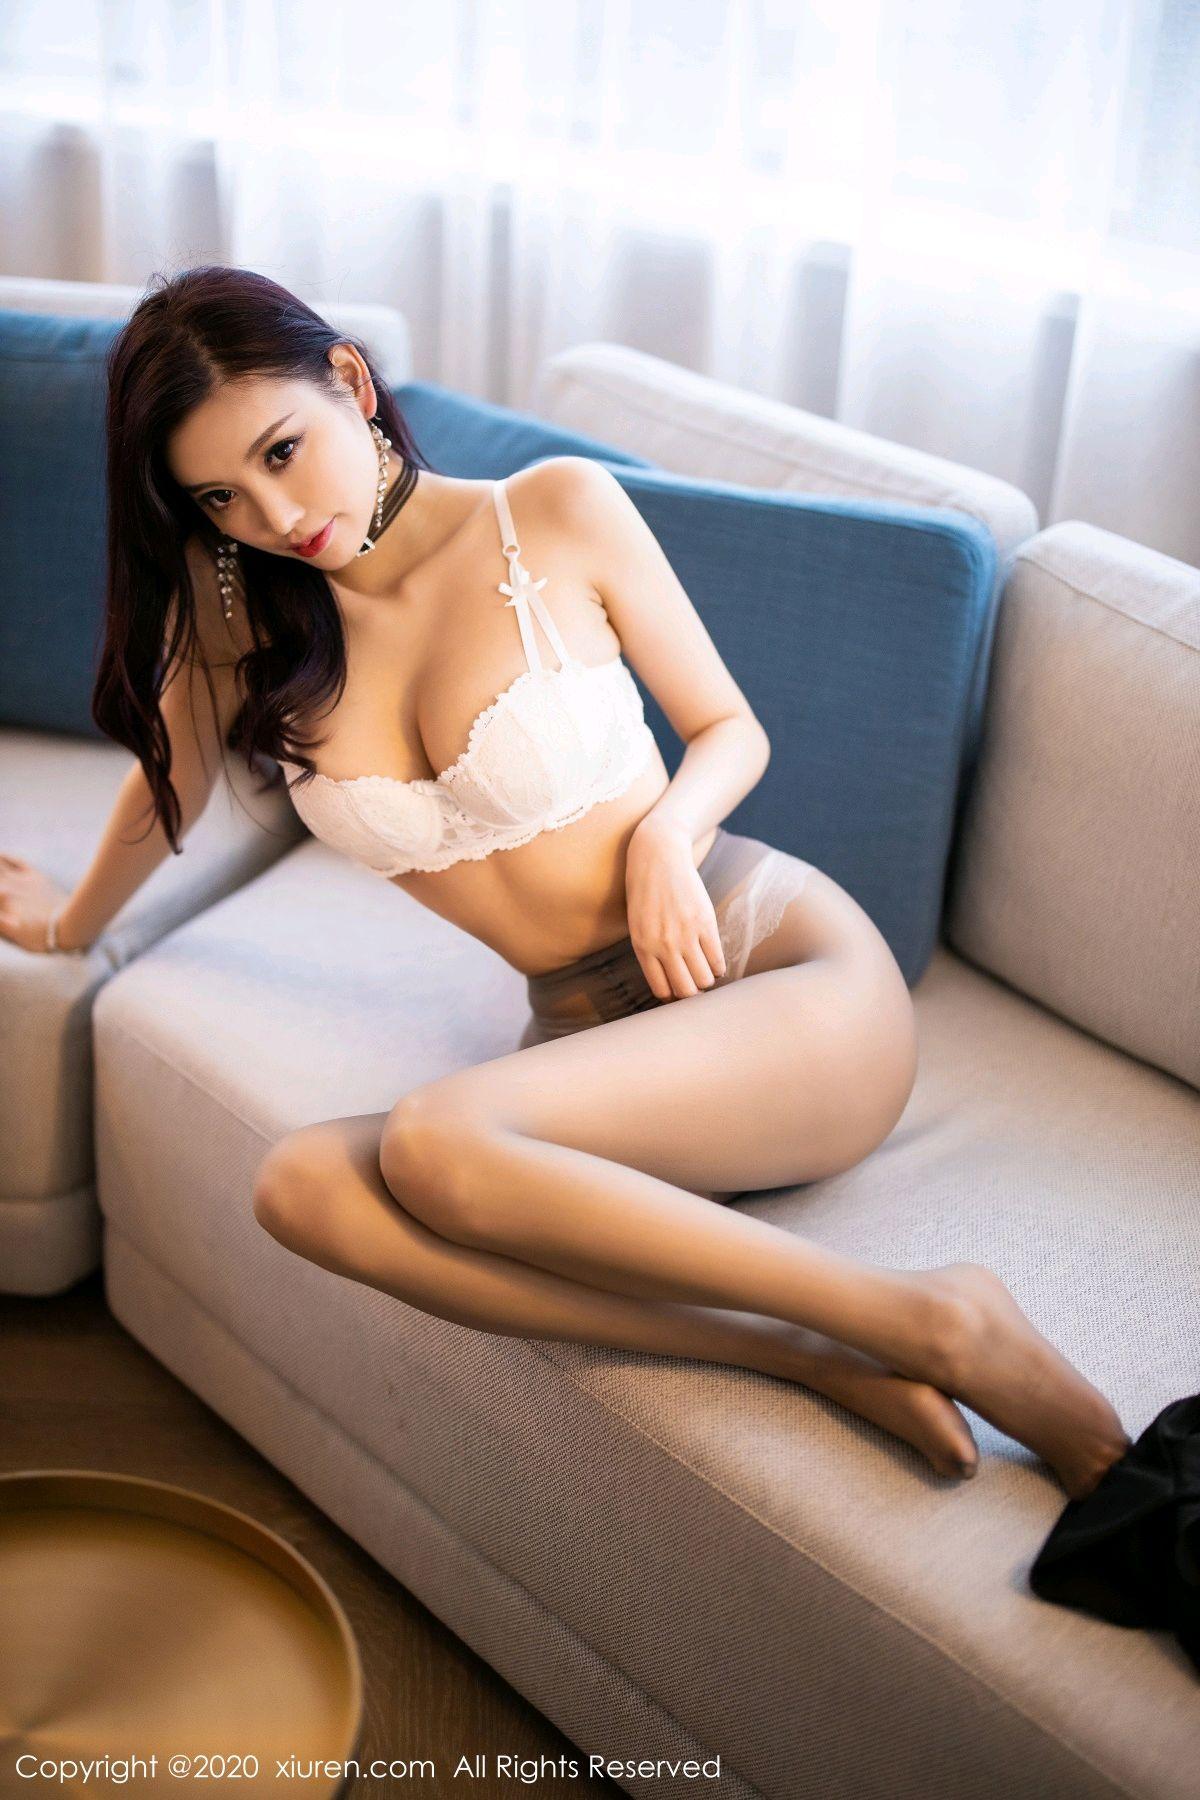 [XiuRen] Vol.2241 Yang Chen Chen 25P, Underwear, Xiuren, Yang Chen Chen